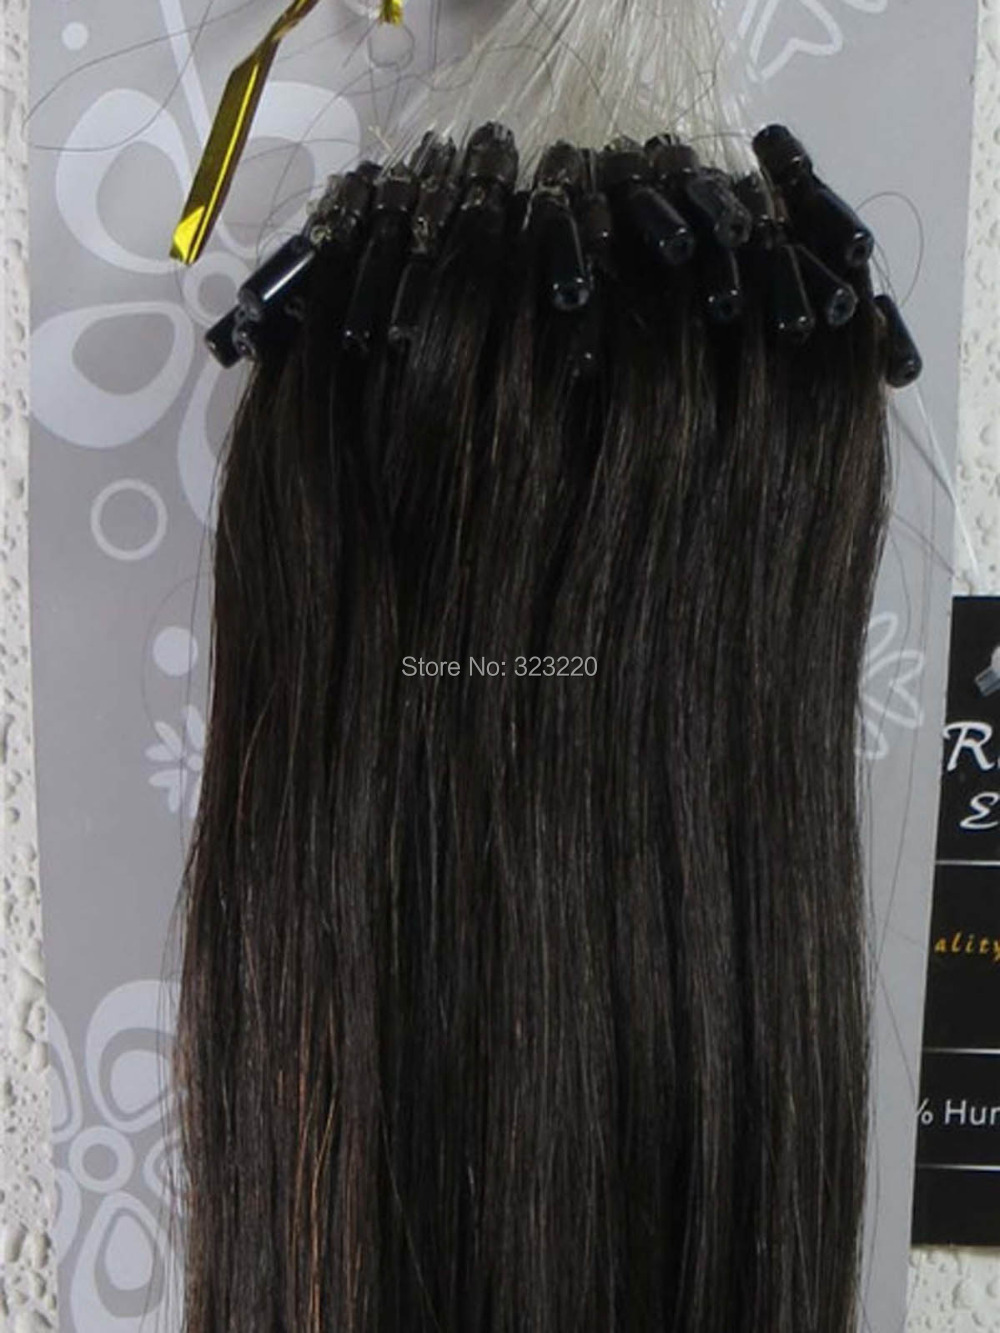 Wholesale Virgin Brazilian 20 22 Womens Human Hair Remy Micro Loop Tip In Extensions Straight 0.5g/s 100s Darkest Brown #2<br><br>Aliexpress